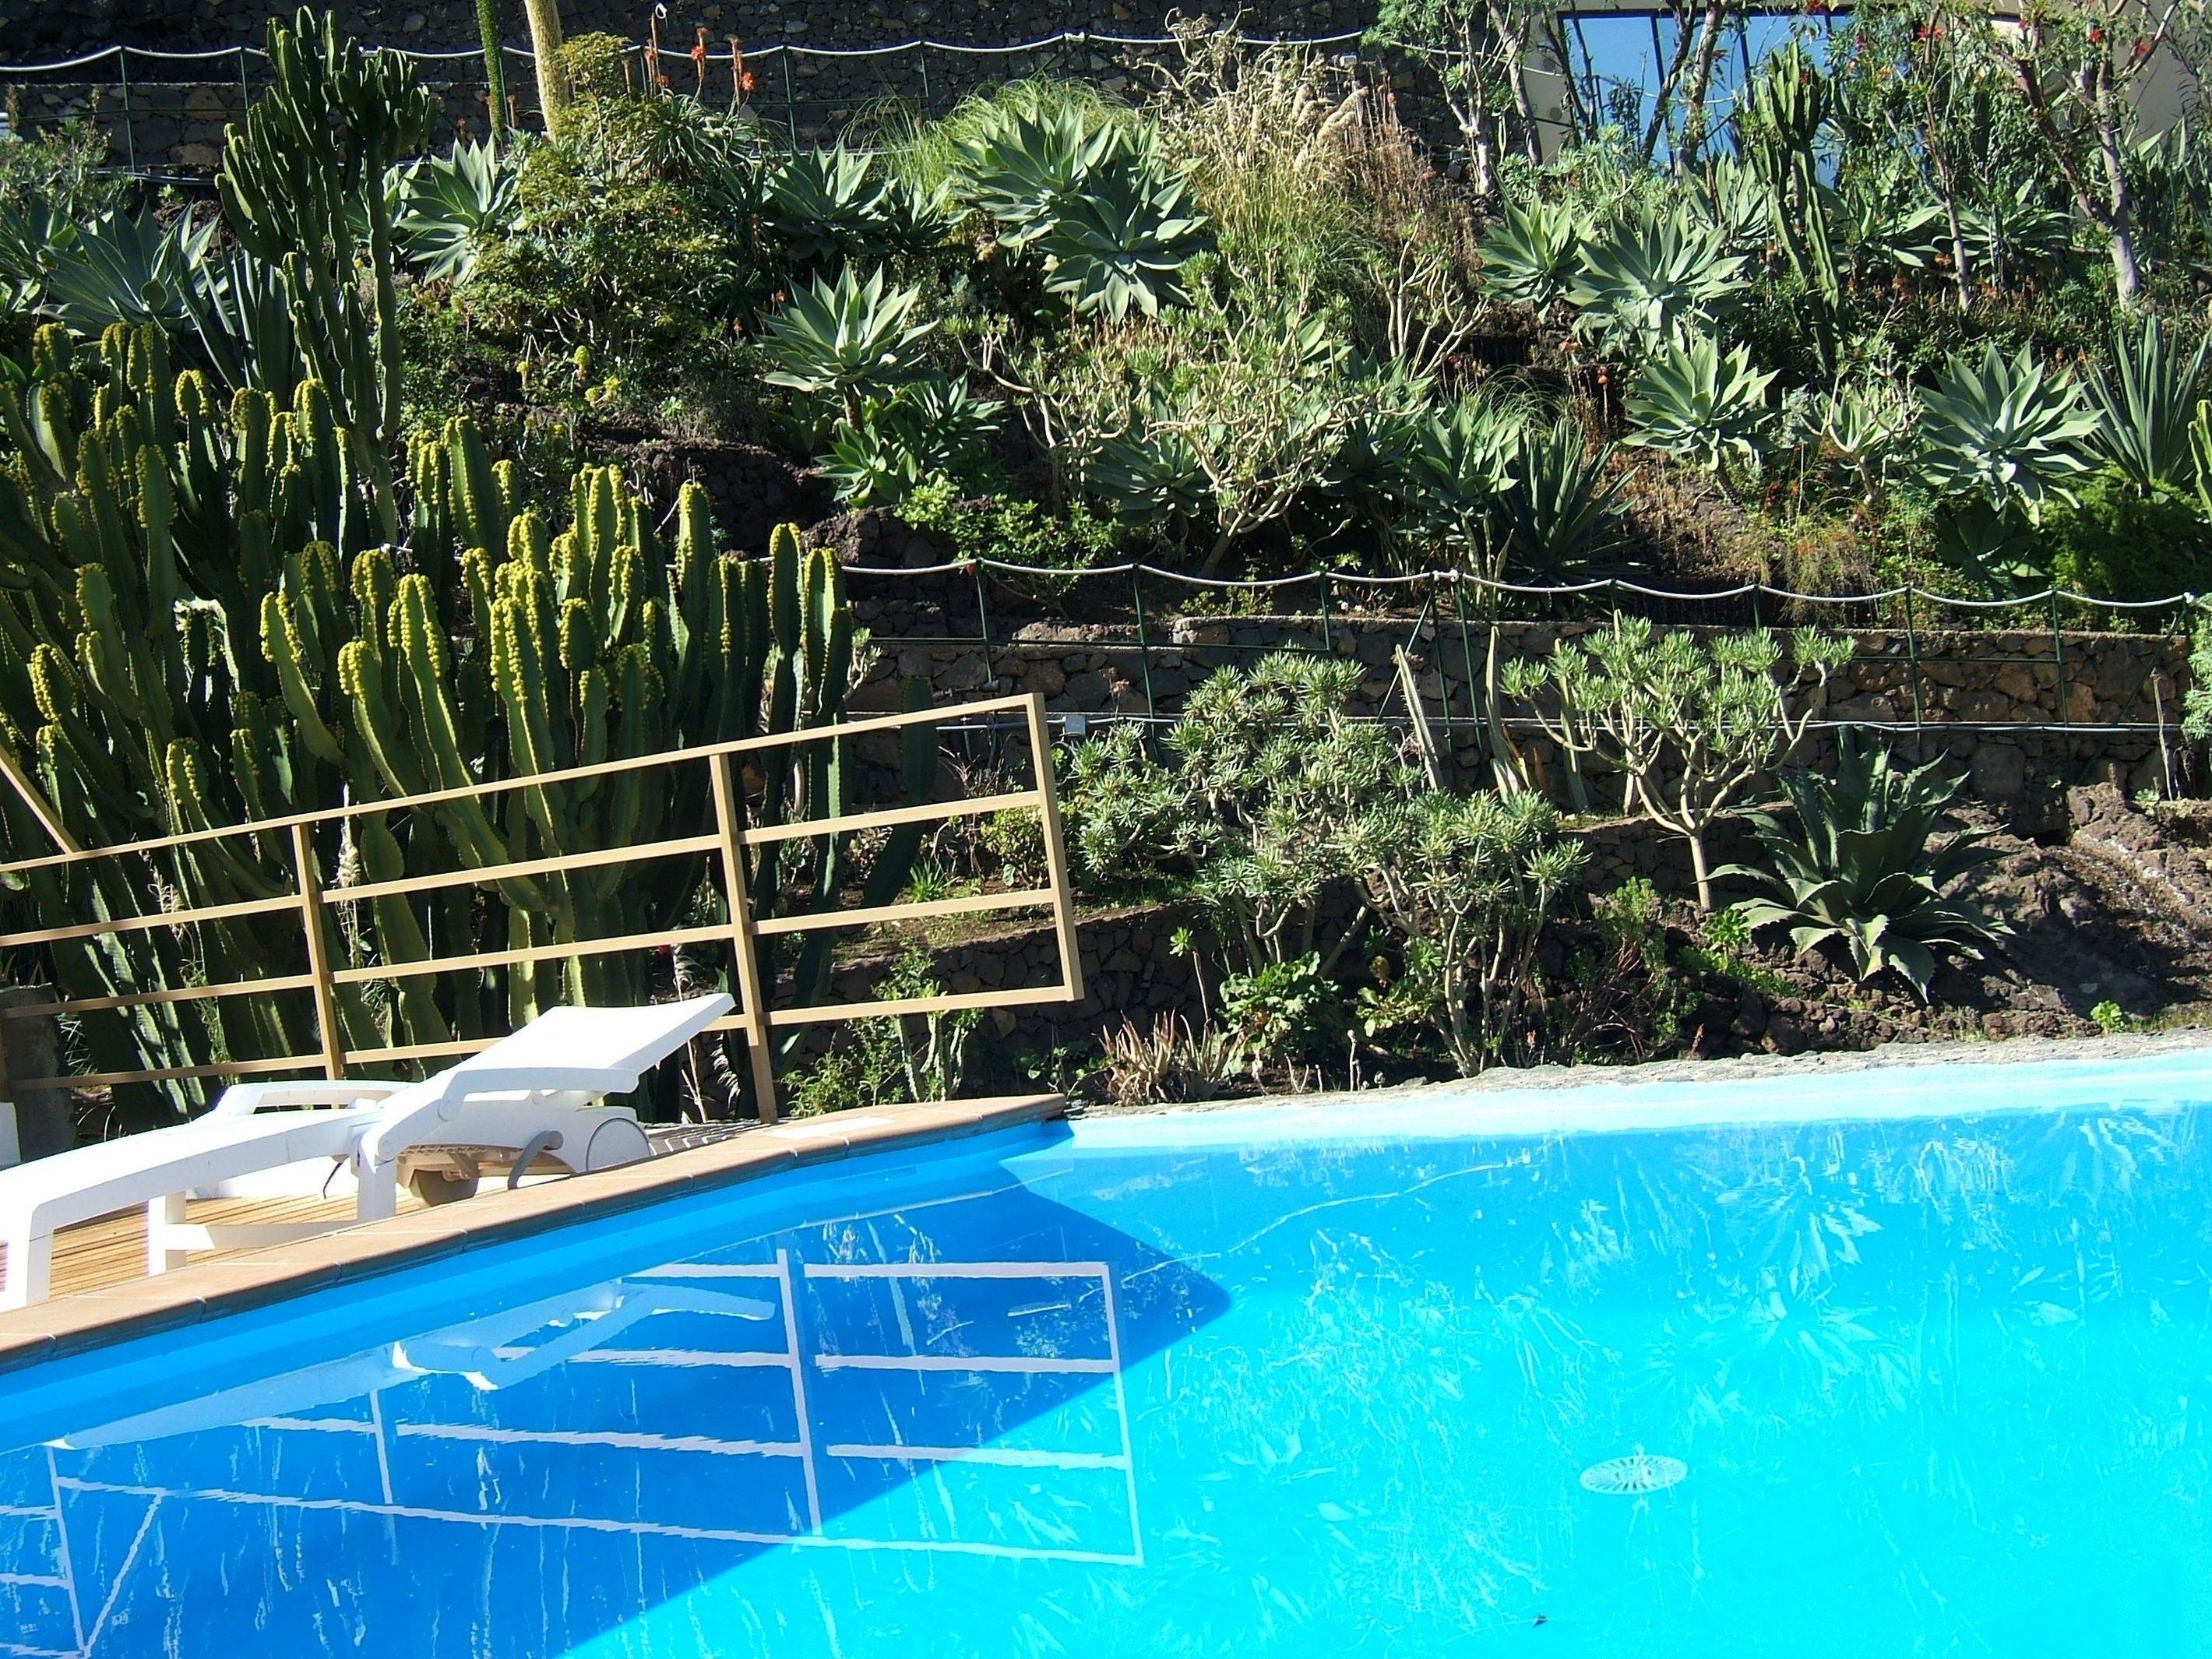 Appartement de vacances Fewo Atico Marazul, mit  Panorama- und Meerblick, Pool, Terrasse, Grill, Parkplatz und WLA (2492979), Santa Ursula, Ténérife, Iles Canaries, Espagne, image 17